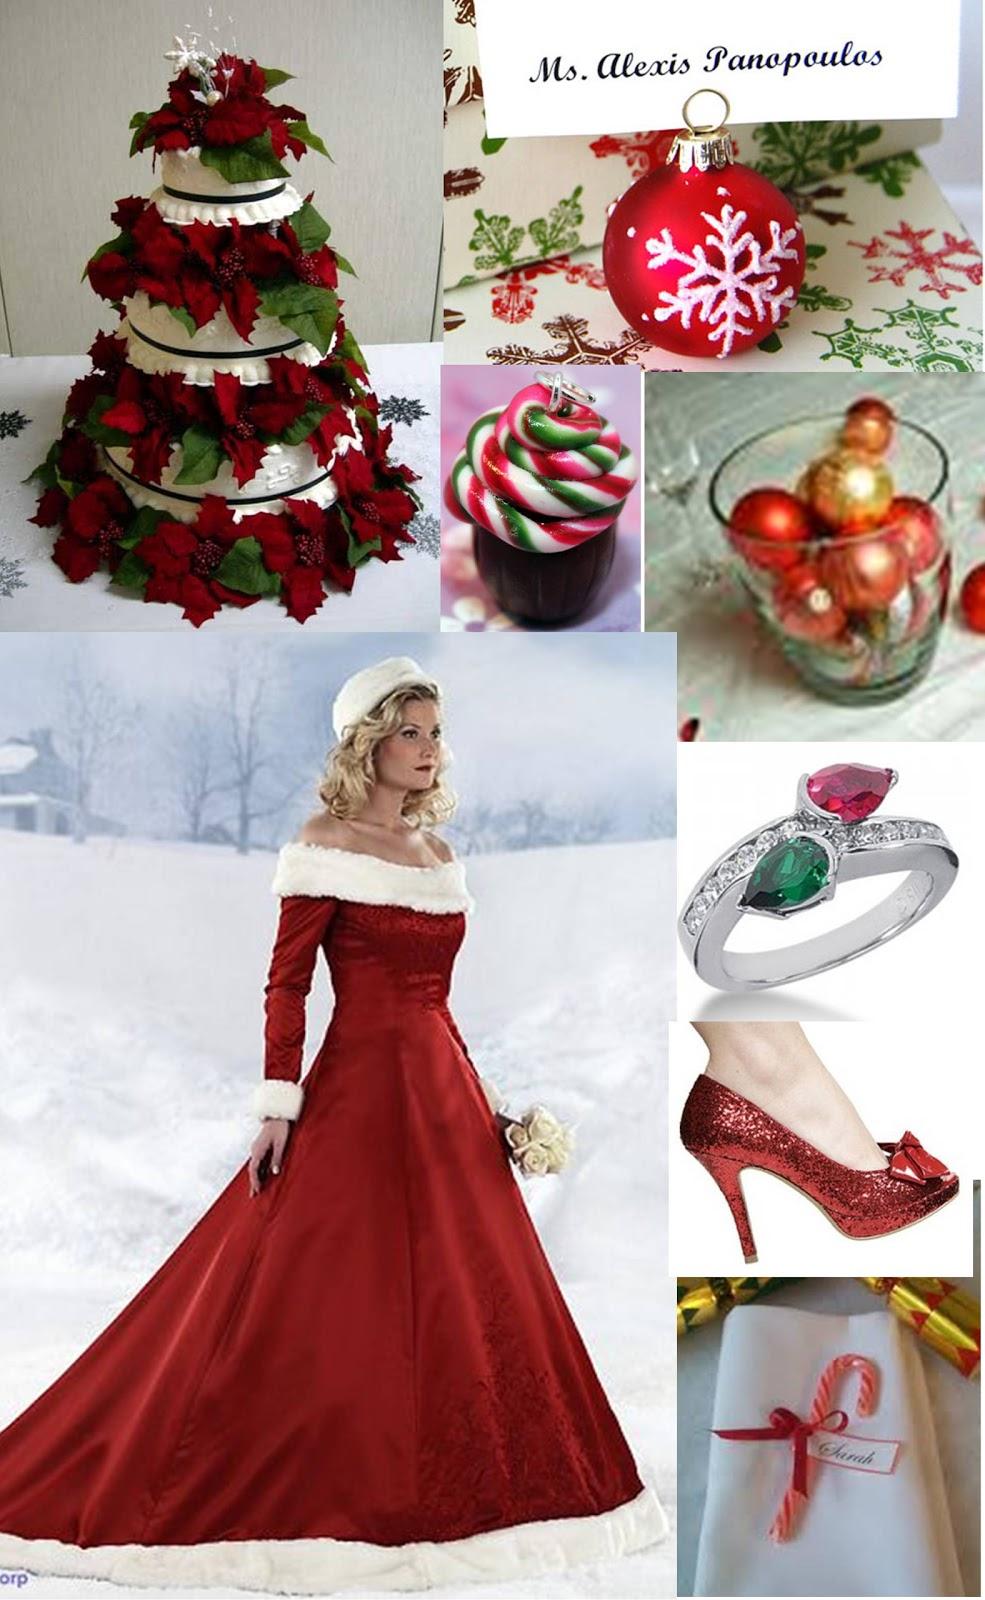 1000 images about Christmas Wedding Theme Inspiration on Pinterest  Christmas wedding